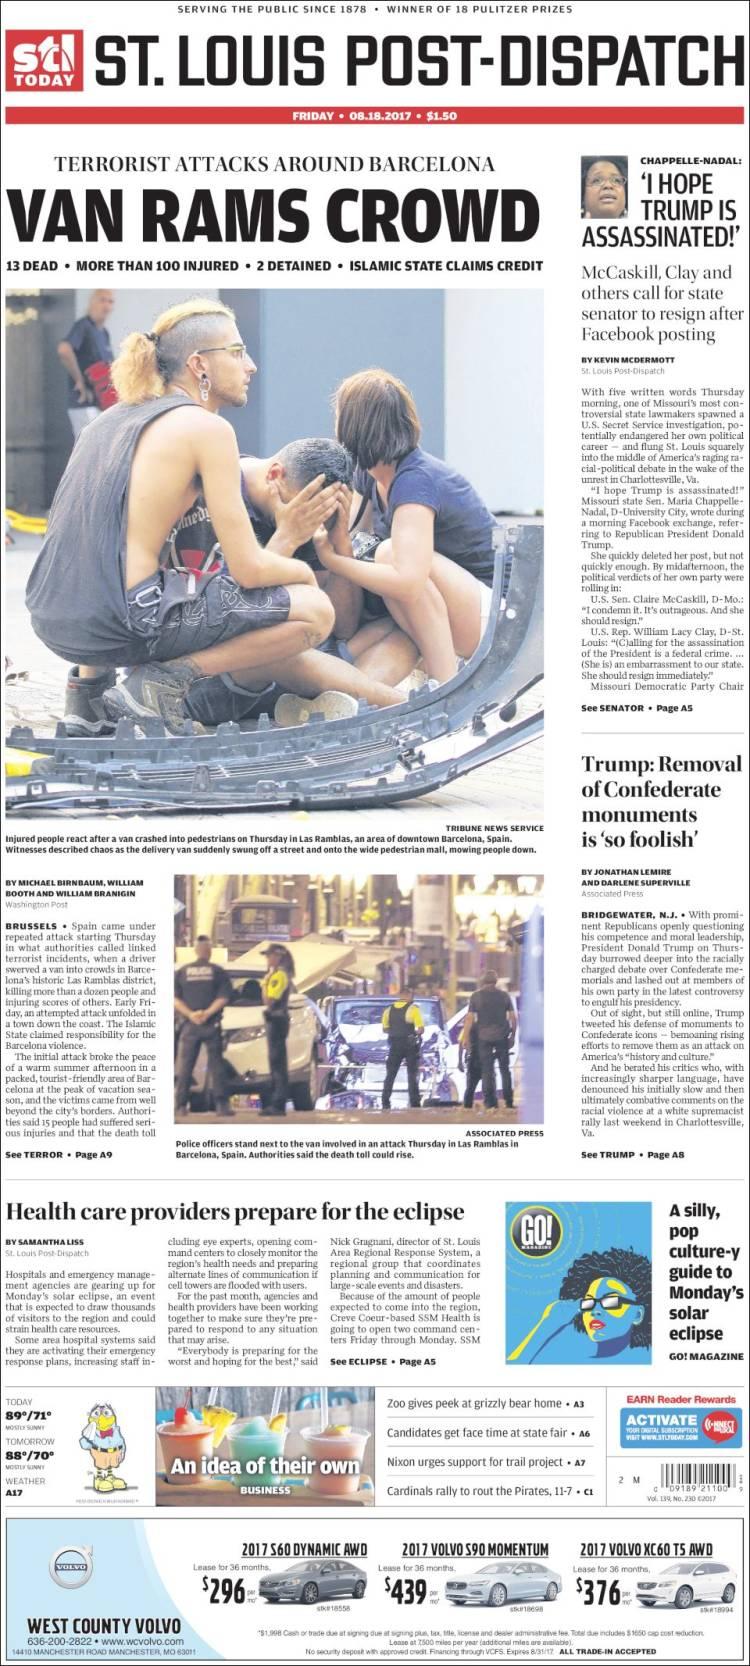 Portada de St. Louis Post-Dispatch (USA)